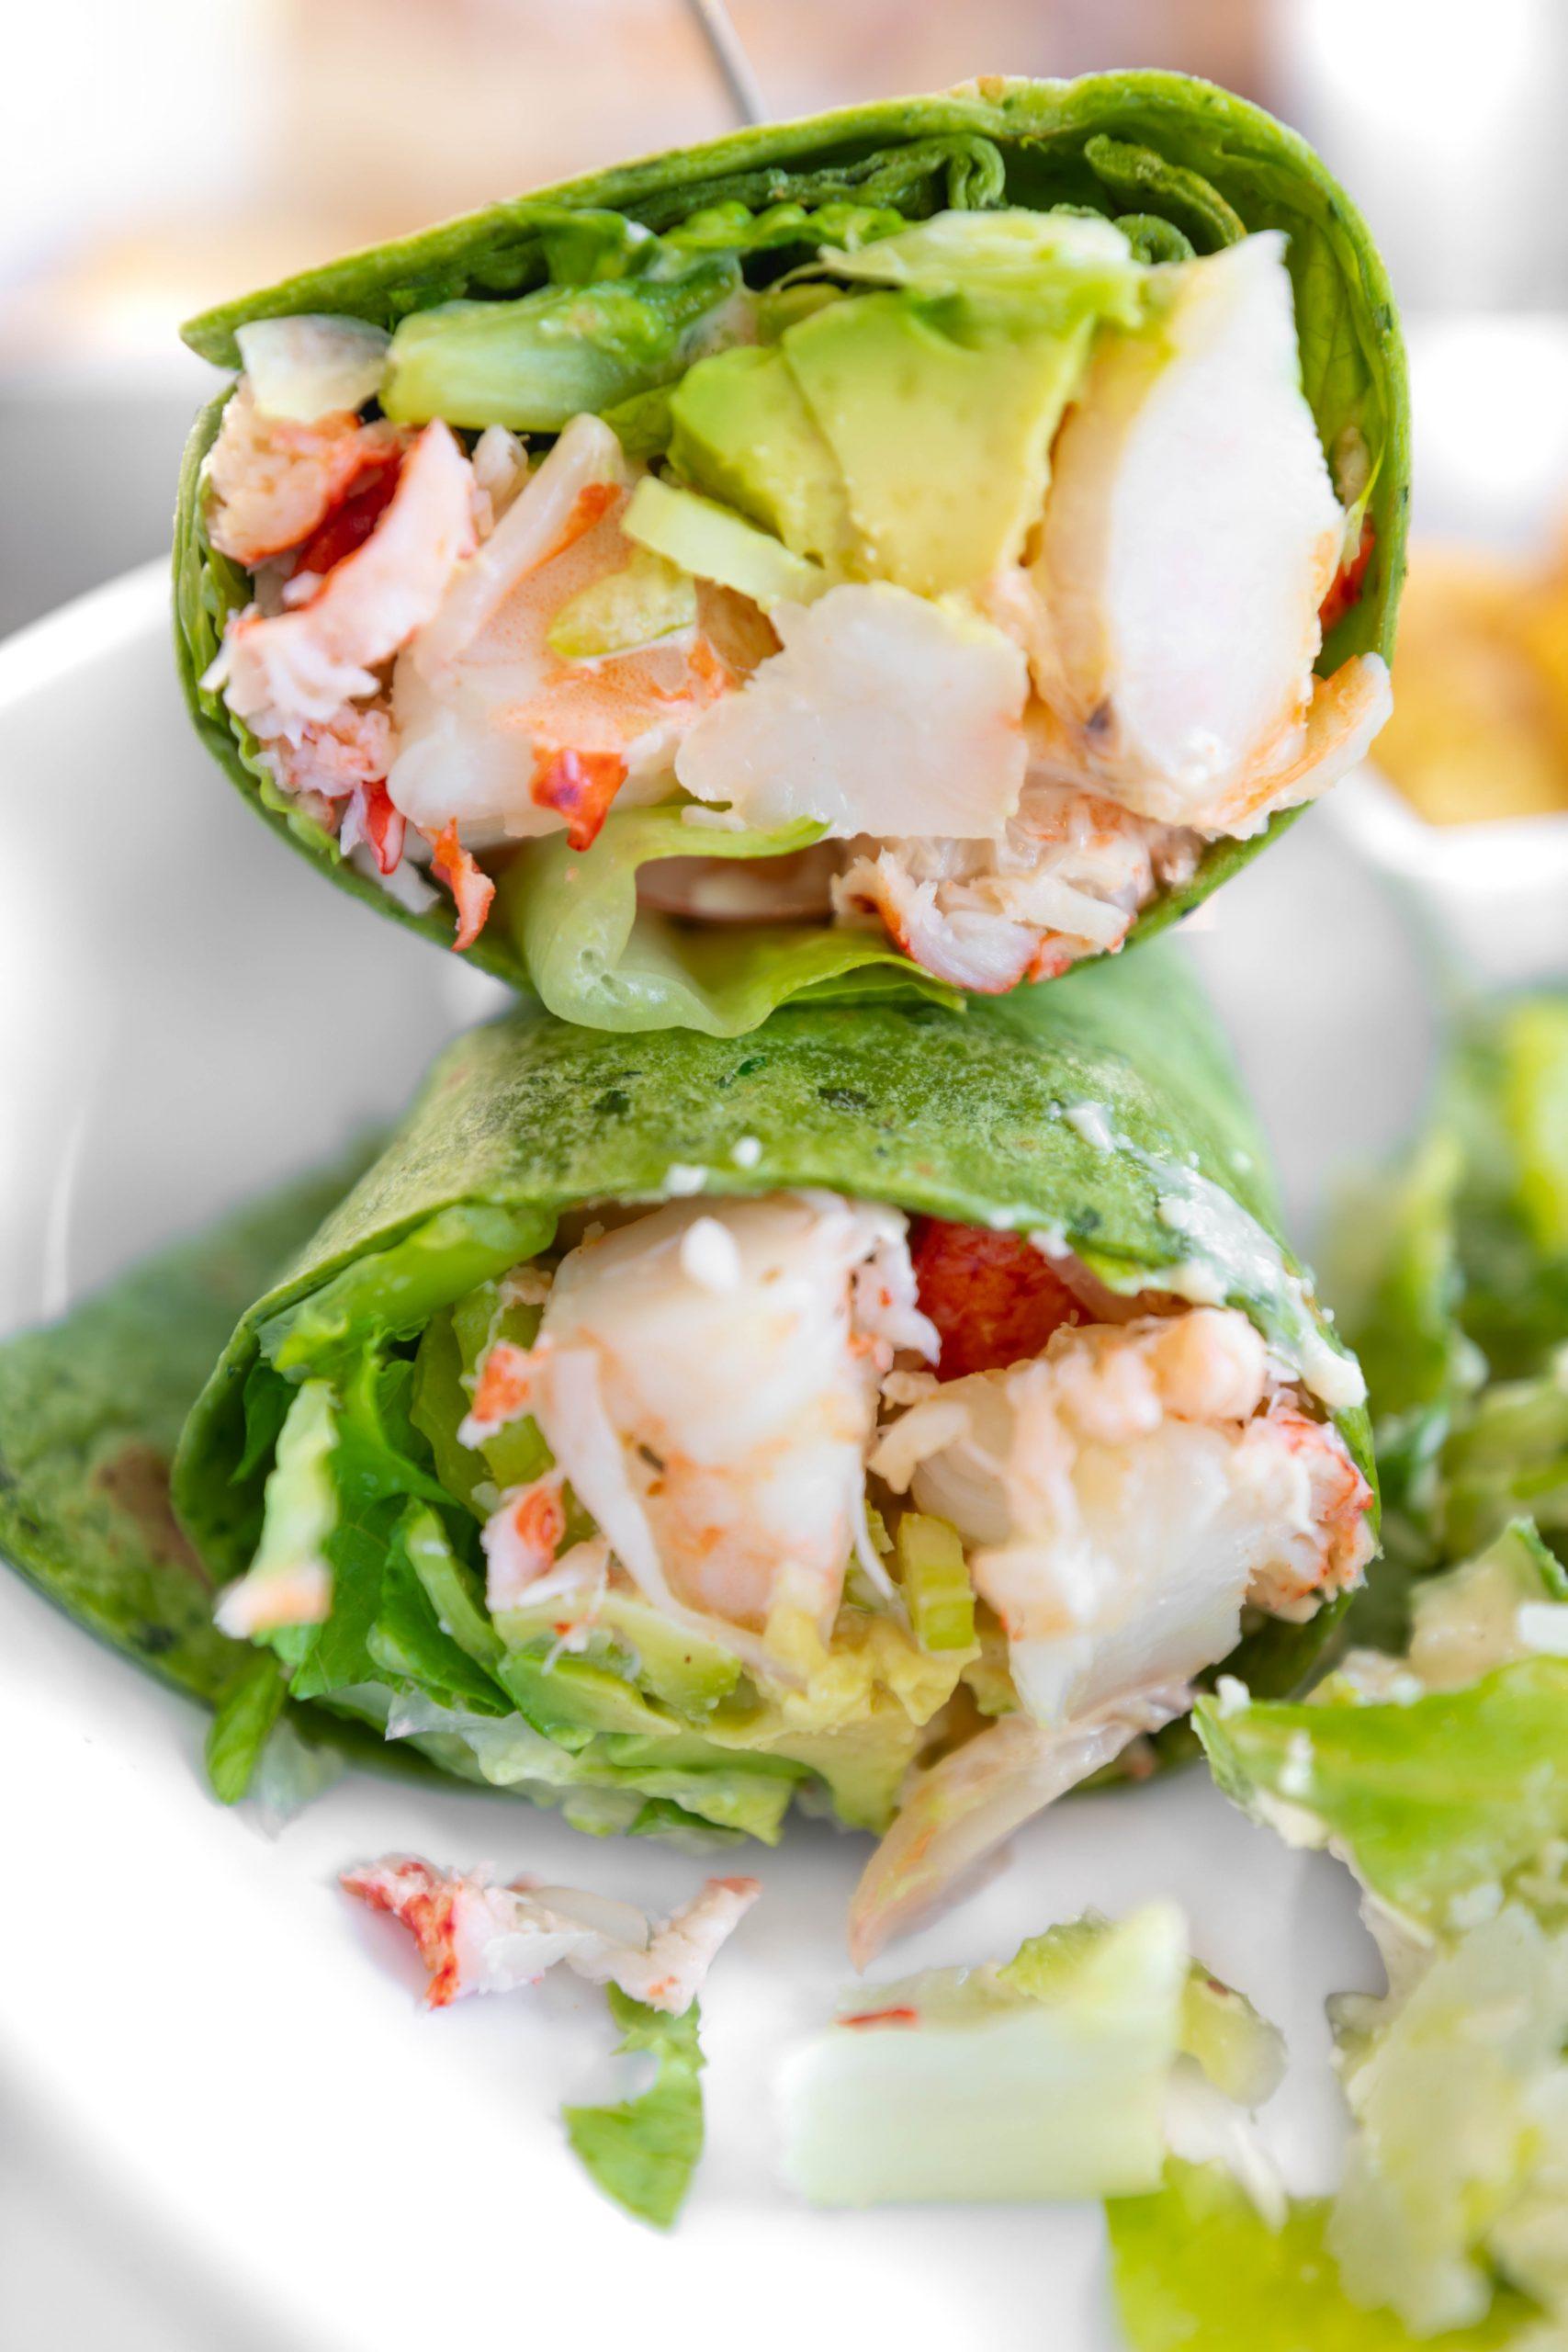 Aquamarine Restaurant Waldorf Astoria Orlando Poolside Restaurant in Orlando Florida Maine Lobster and Golf Shrimp in Spinach Wrap